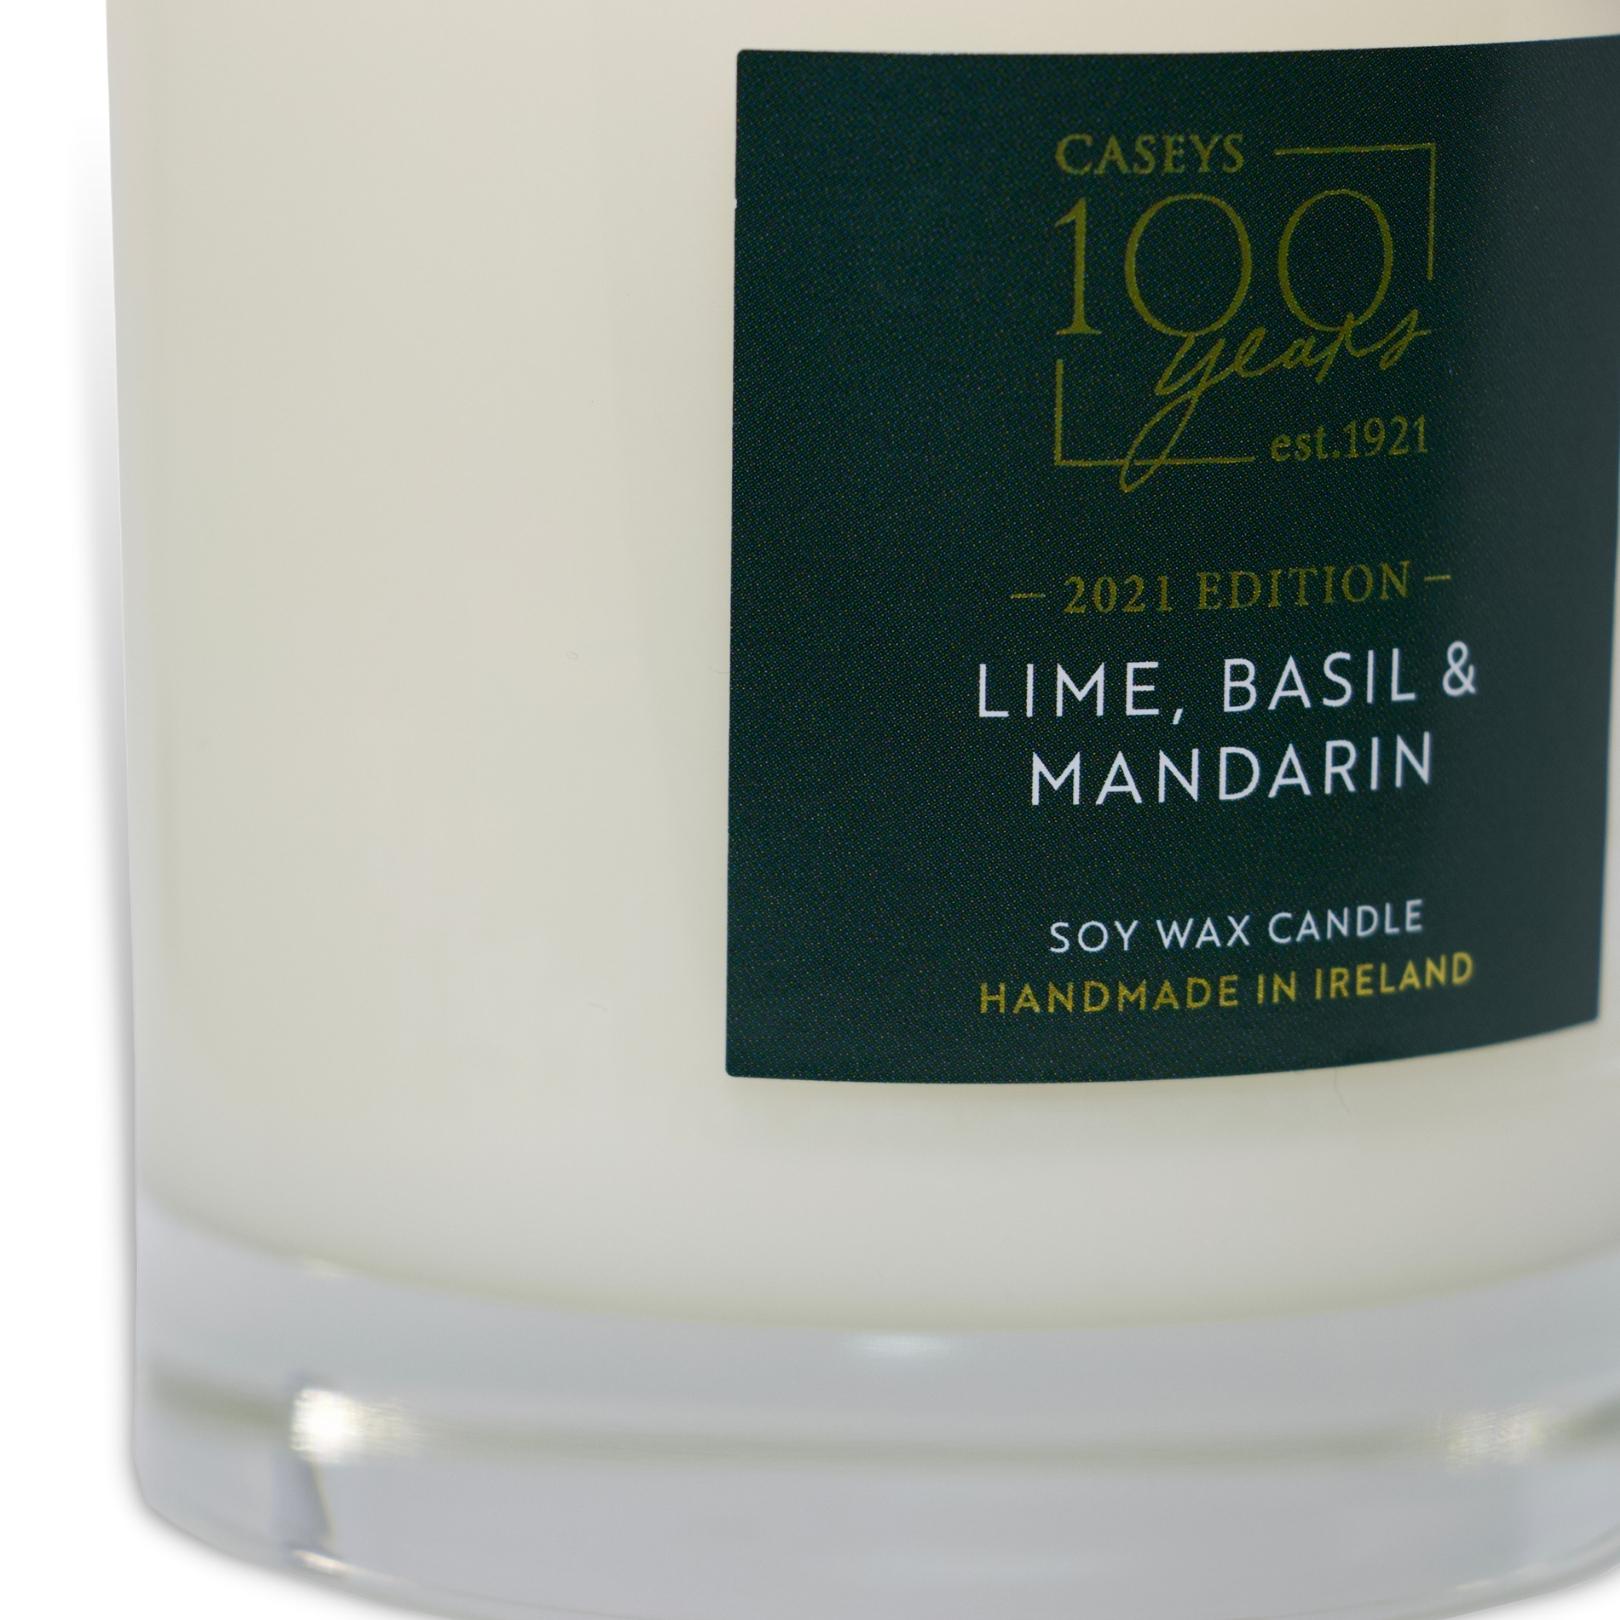 Lime, Basil & Mandarin Anniversary Candle